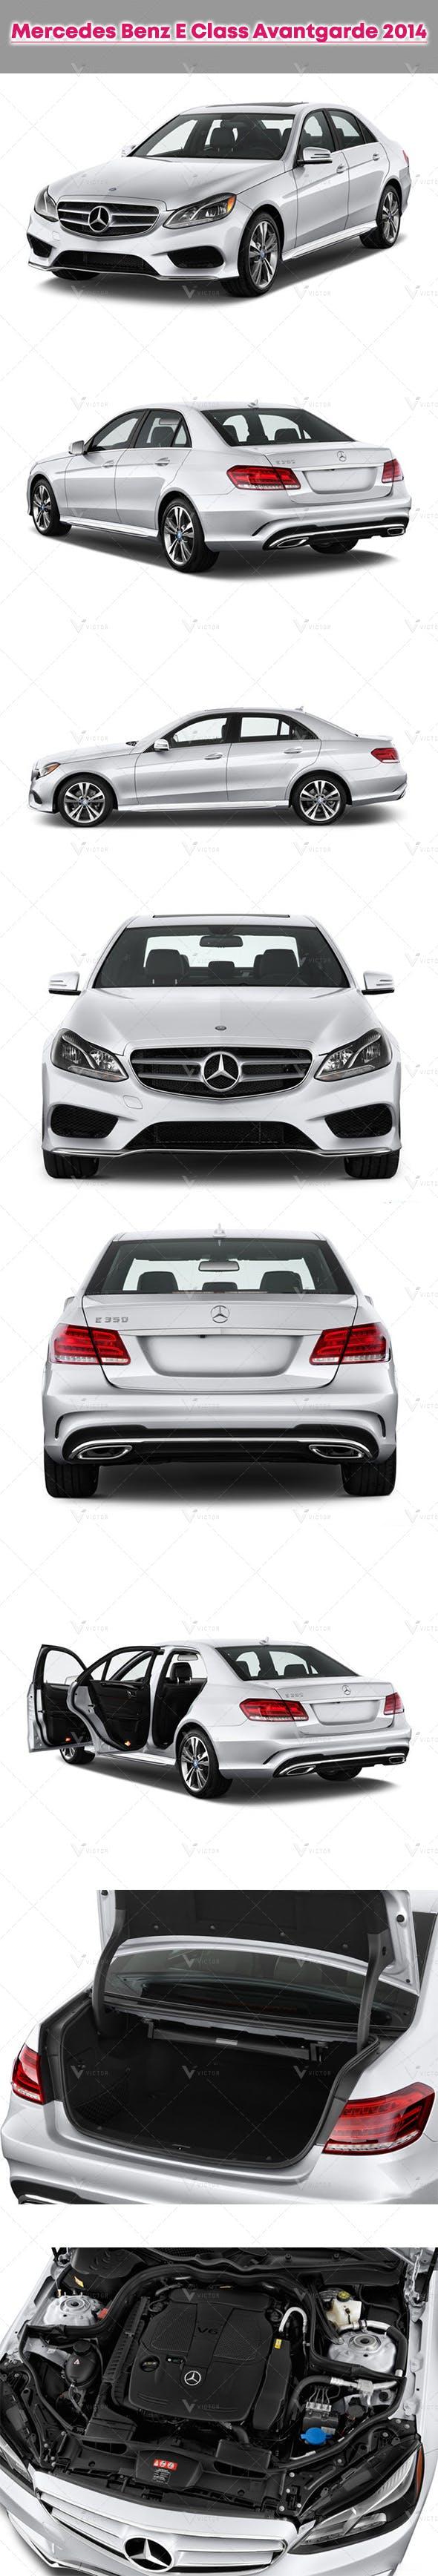 Mercedes Benz E Class Avantgarde 2014 - 3DOcean Item for Sale